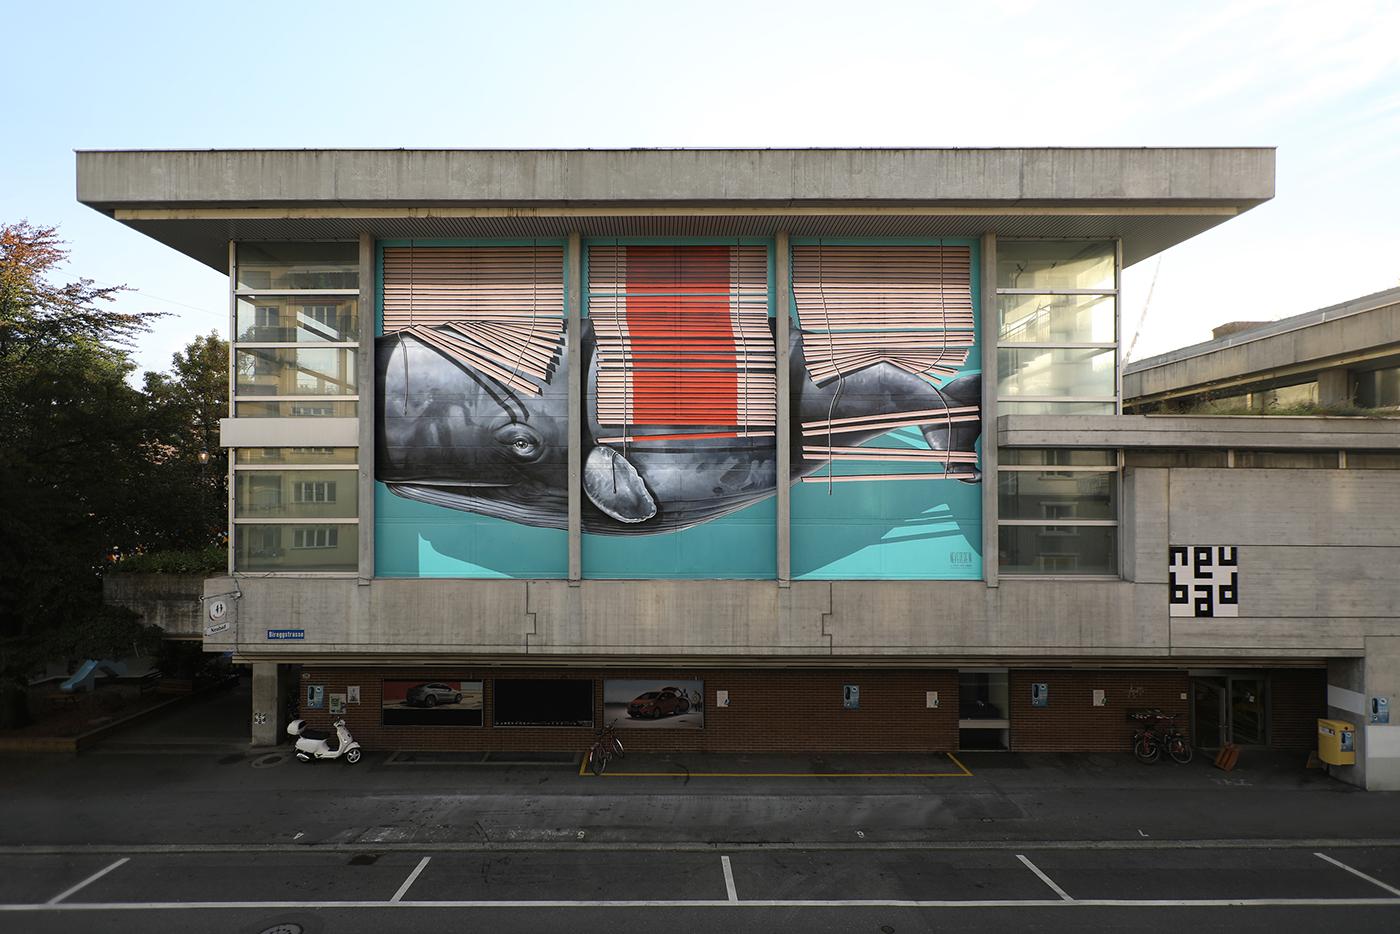 never-crew-graffiti-mural-art-social-global- (7)